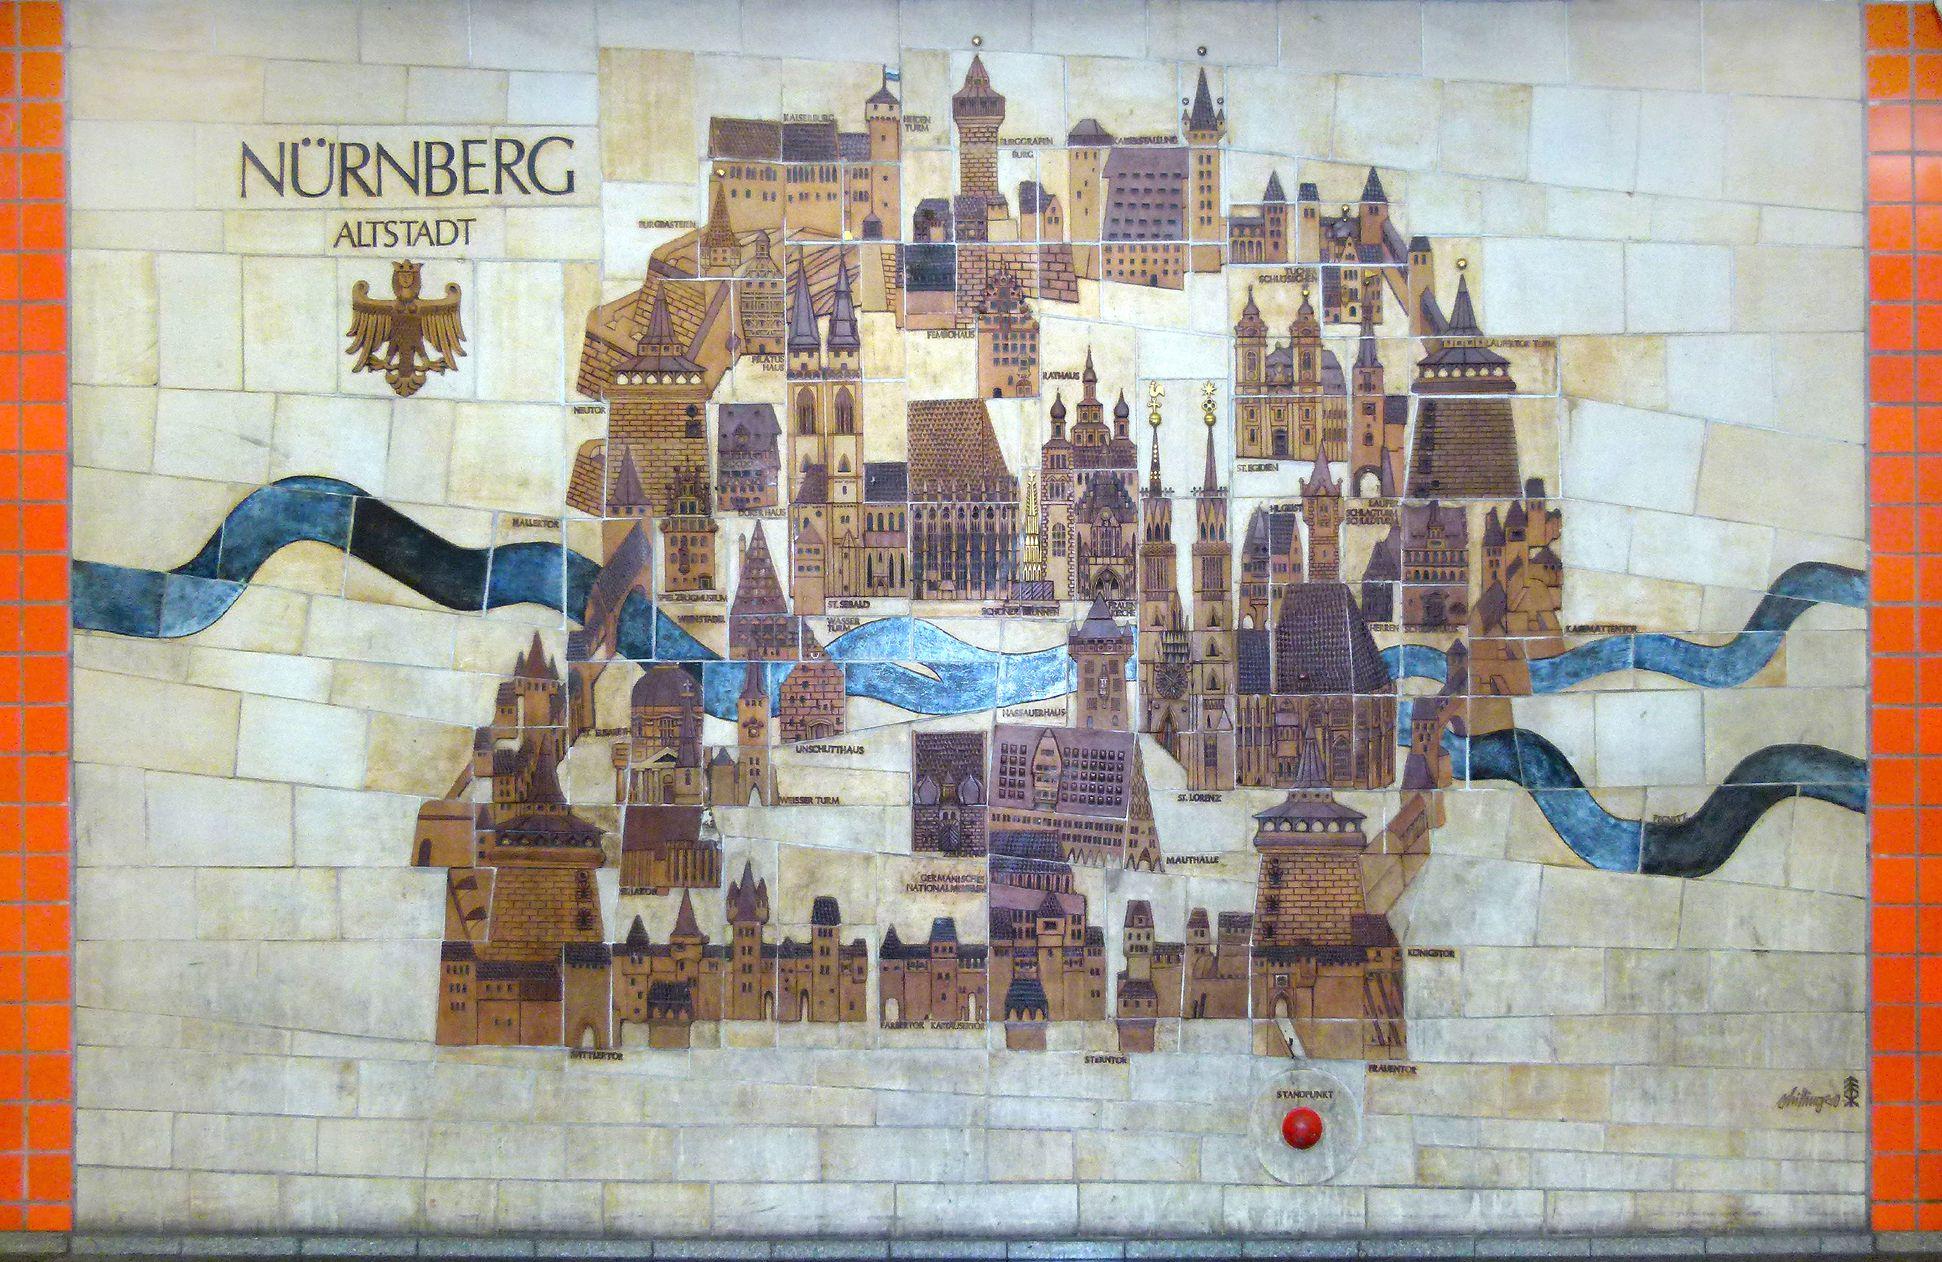 Keramikrelief der Nürnberger Altstadt Gesamtansicht